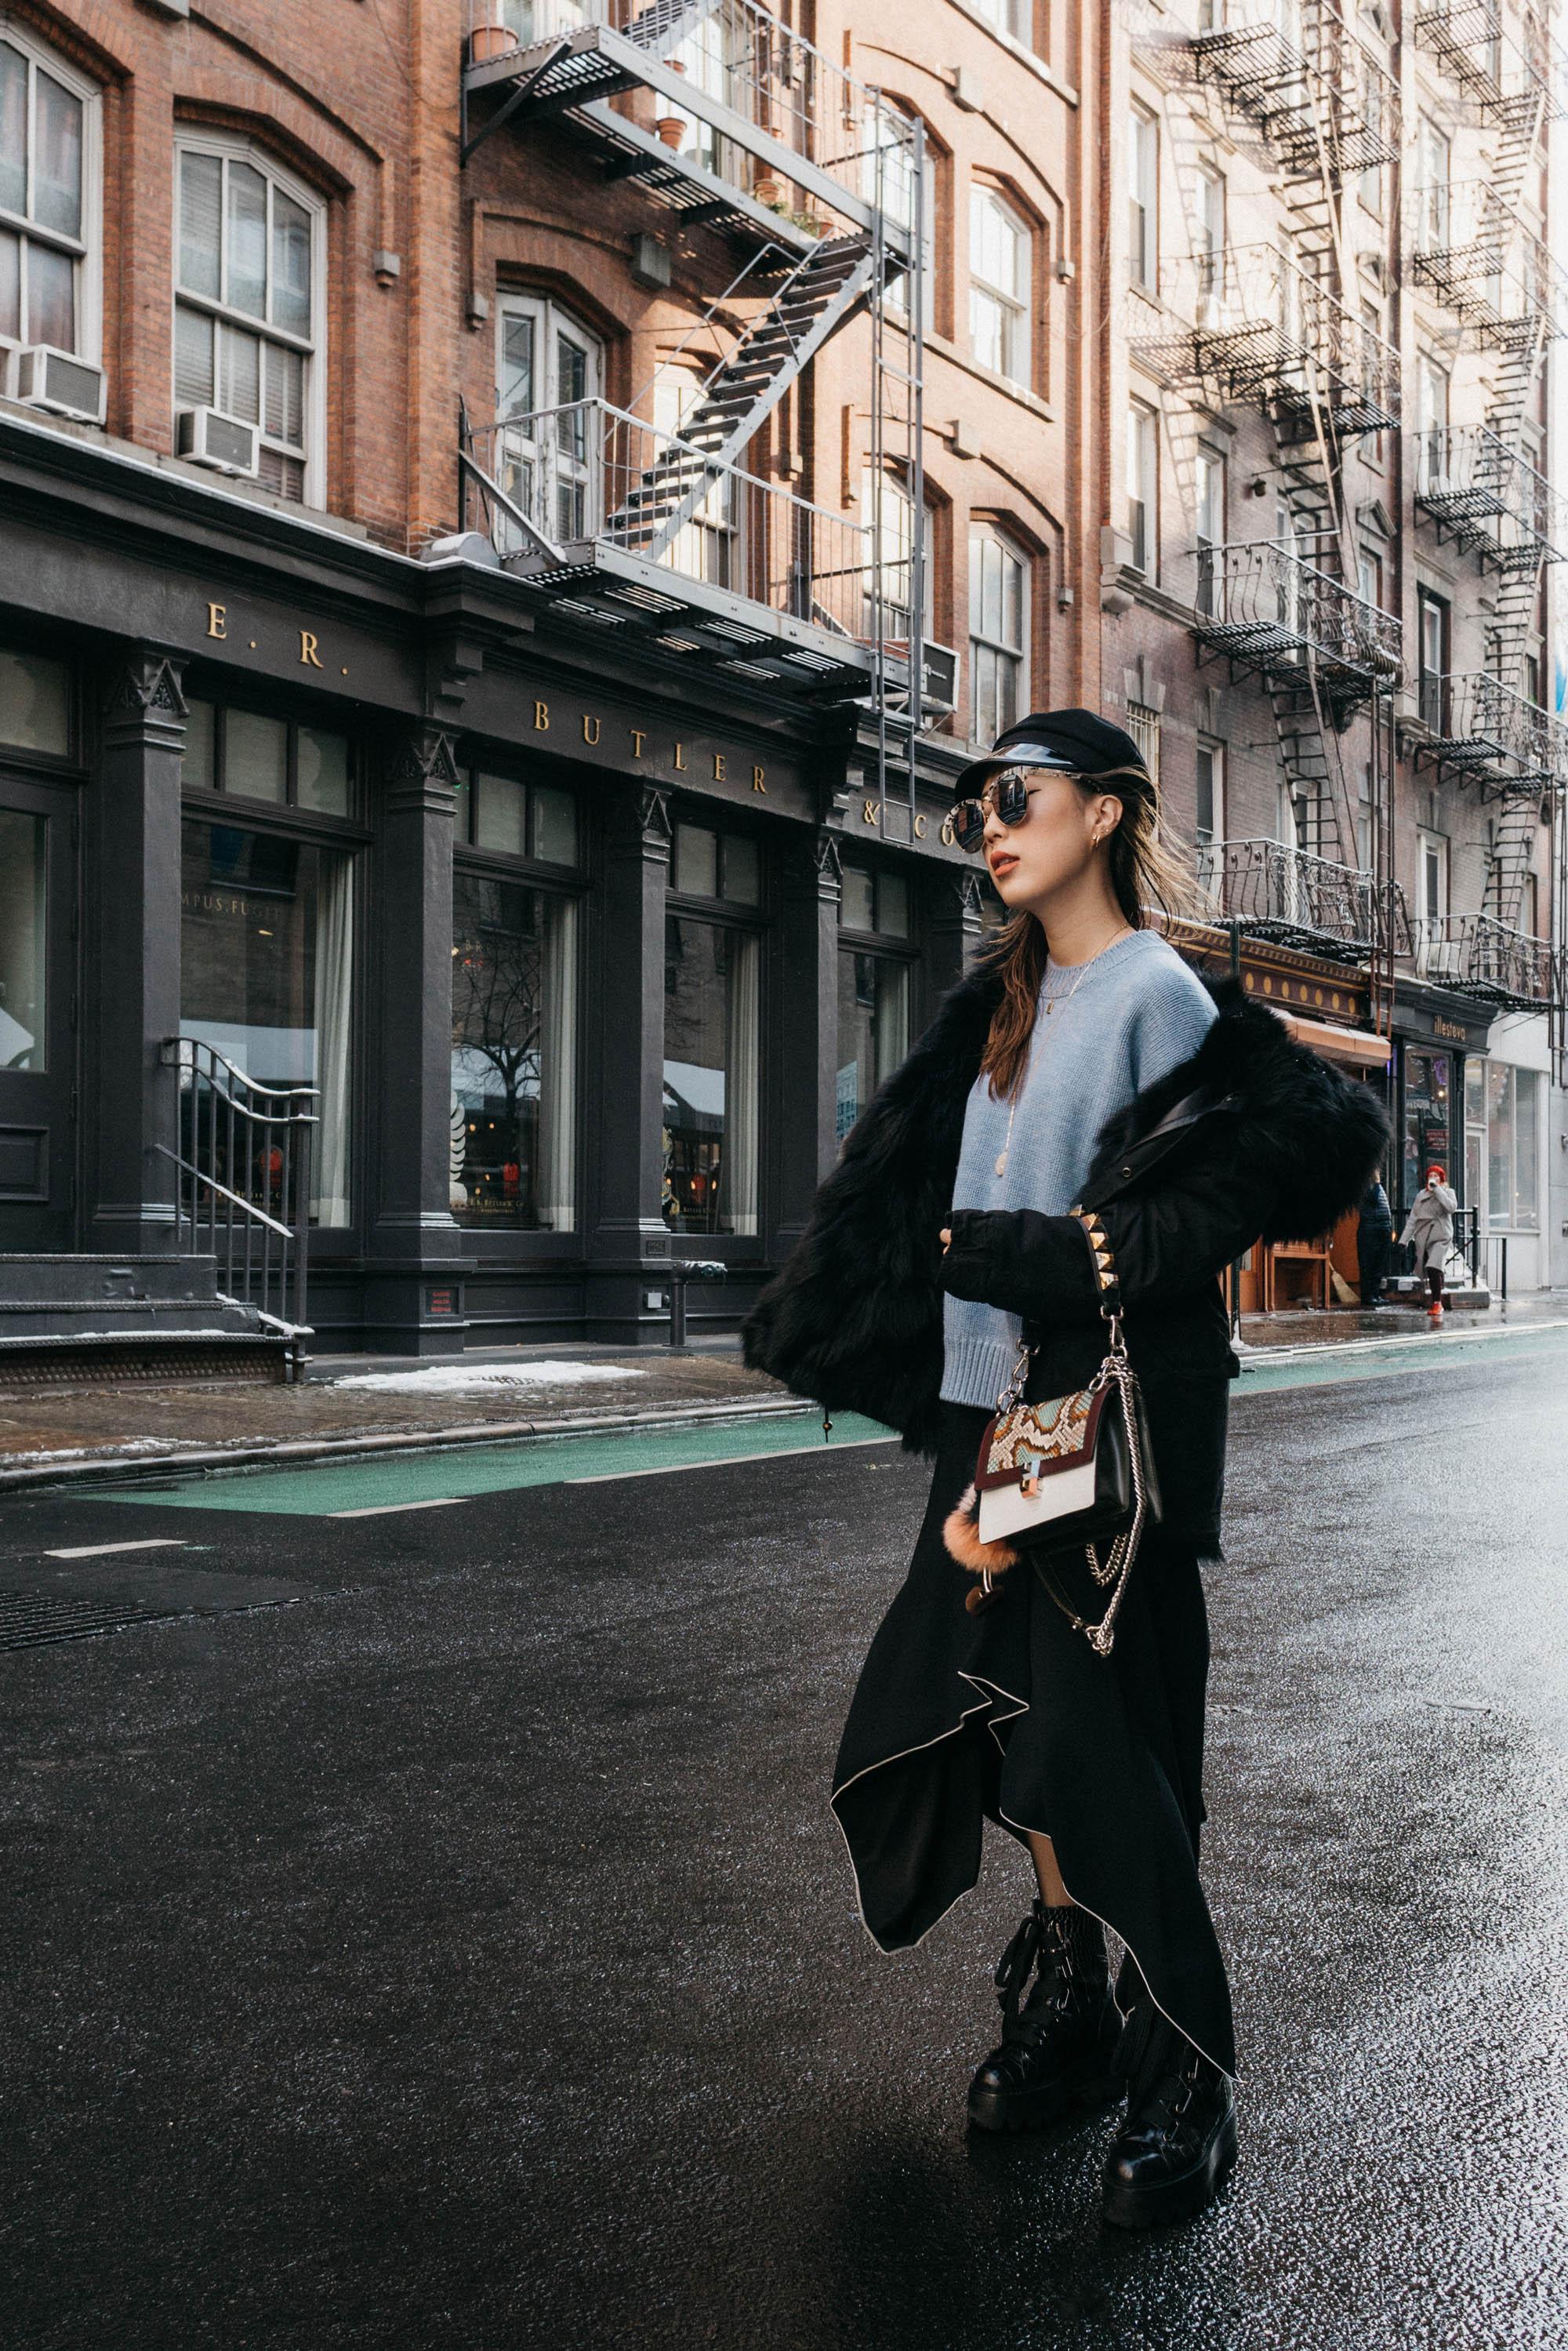 Mr & Mrs Italy Coat ,  Mansur Gavriel Sweater , Proenza Schouler Skirt, Ellery Boots, Fendi Bag, Gentle Monster Sunglasses, Gucci Hat